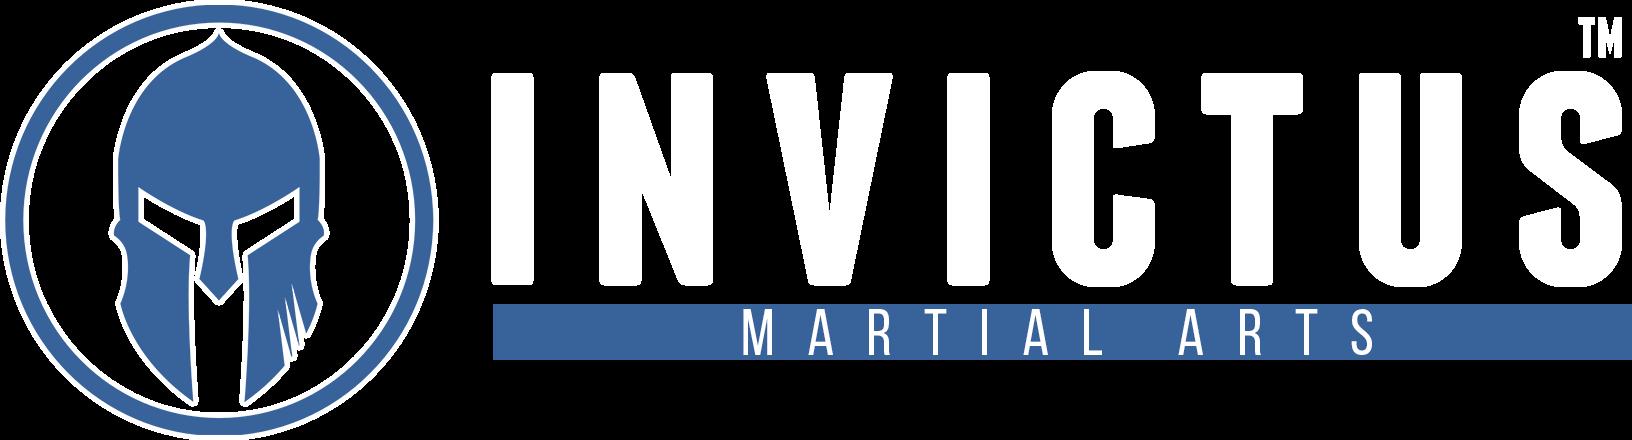 Gracie Jiu Jitsu Muay Thai Kickboxing